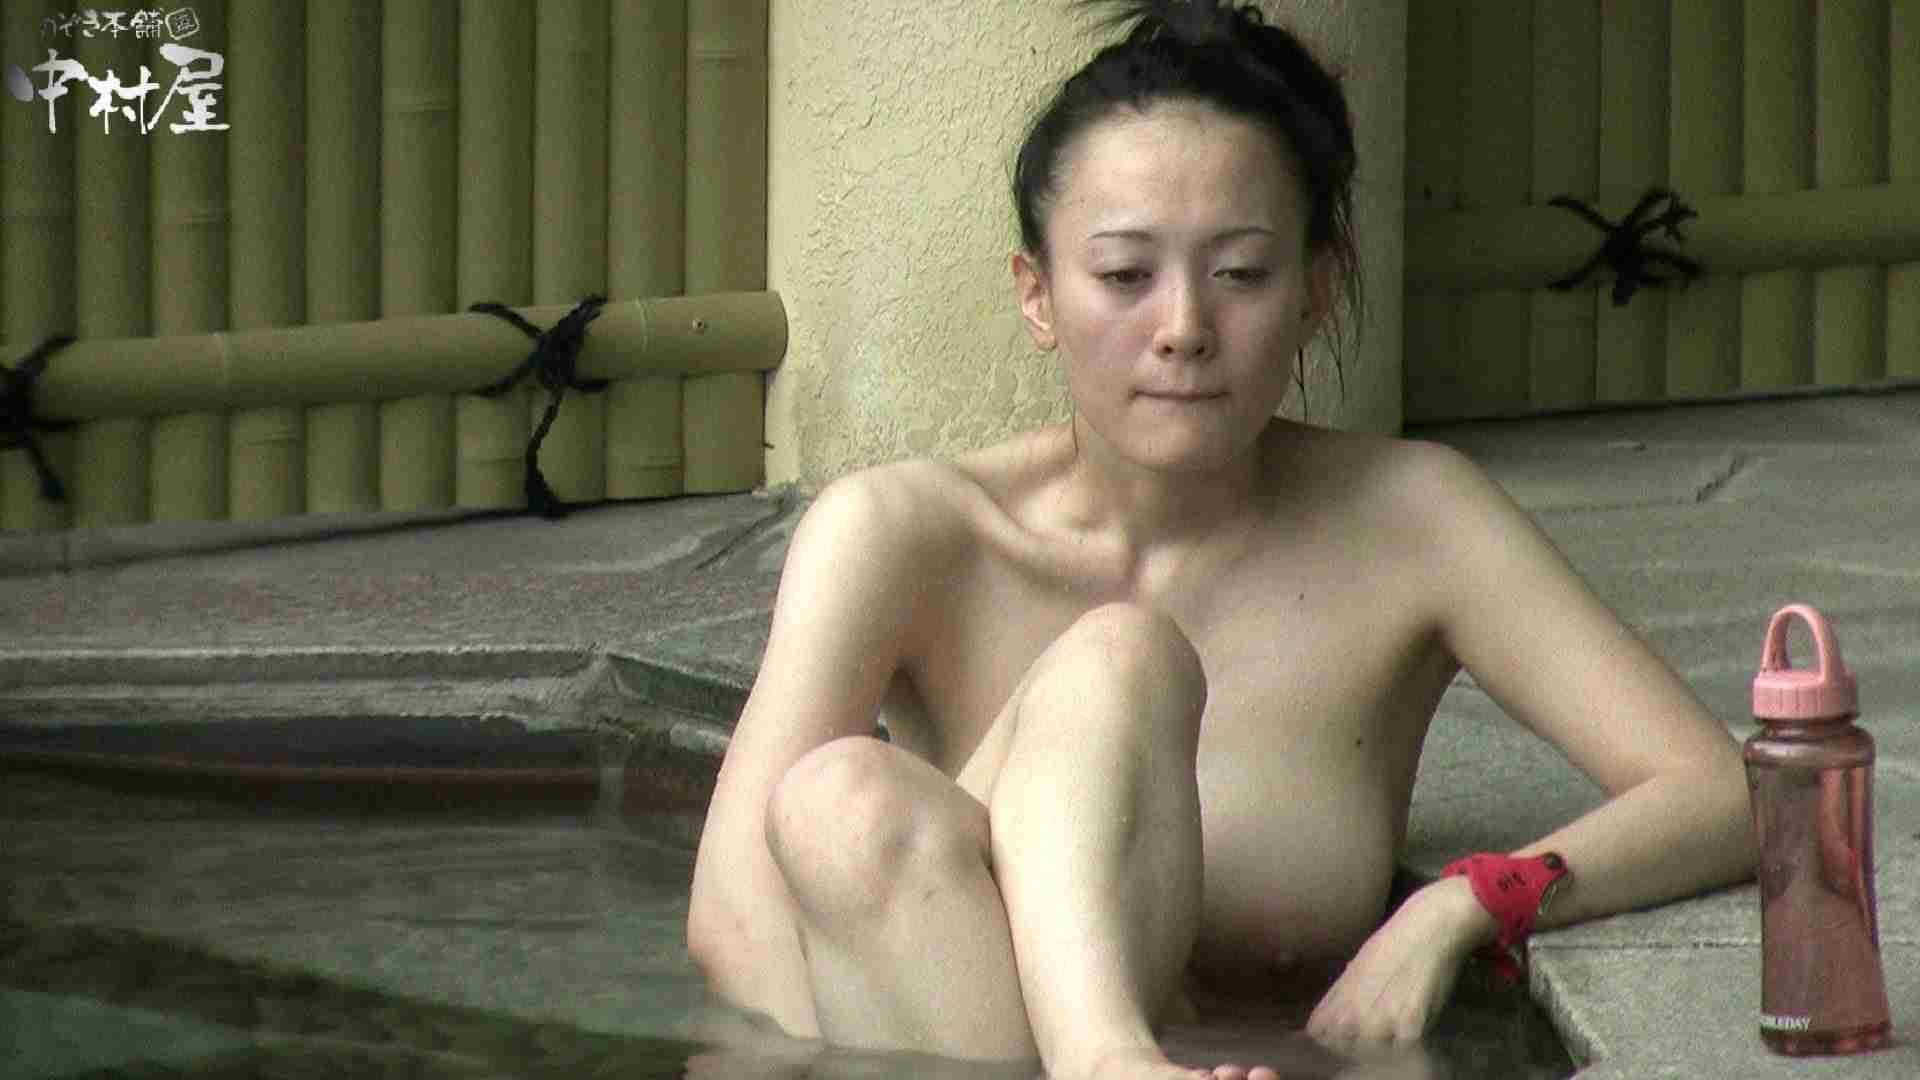 Aquaな露天風呂Vol.900 OLのエロ生活 すけべAV動画紹介 88連発 62